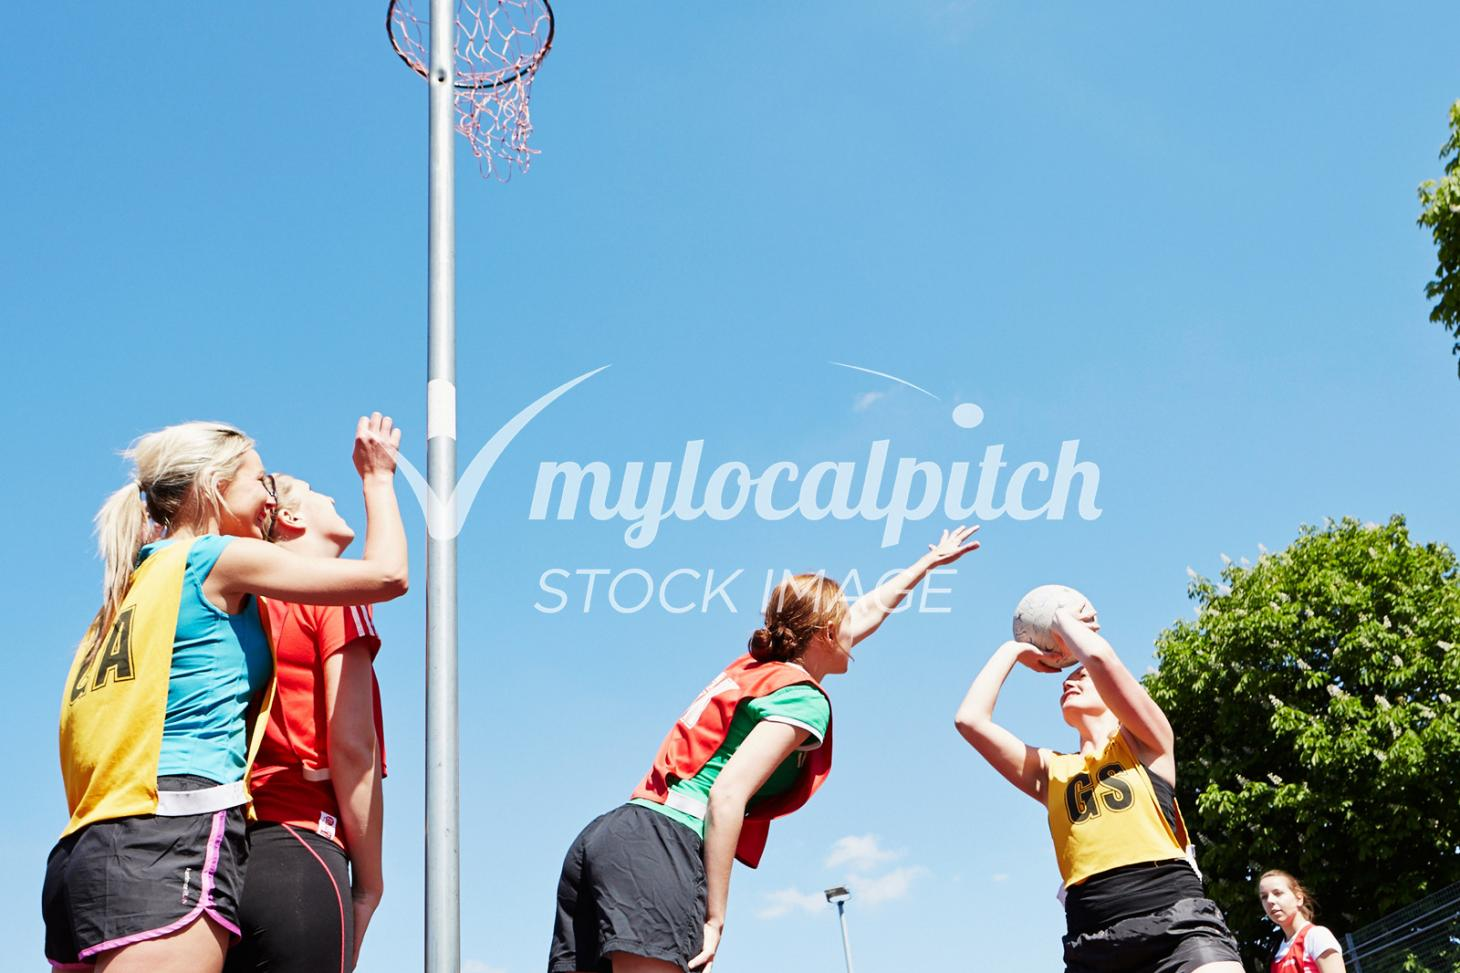 Manshead Church of England Upper School Indoor netball court